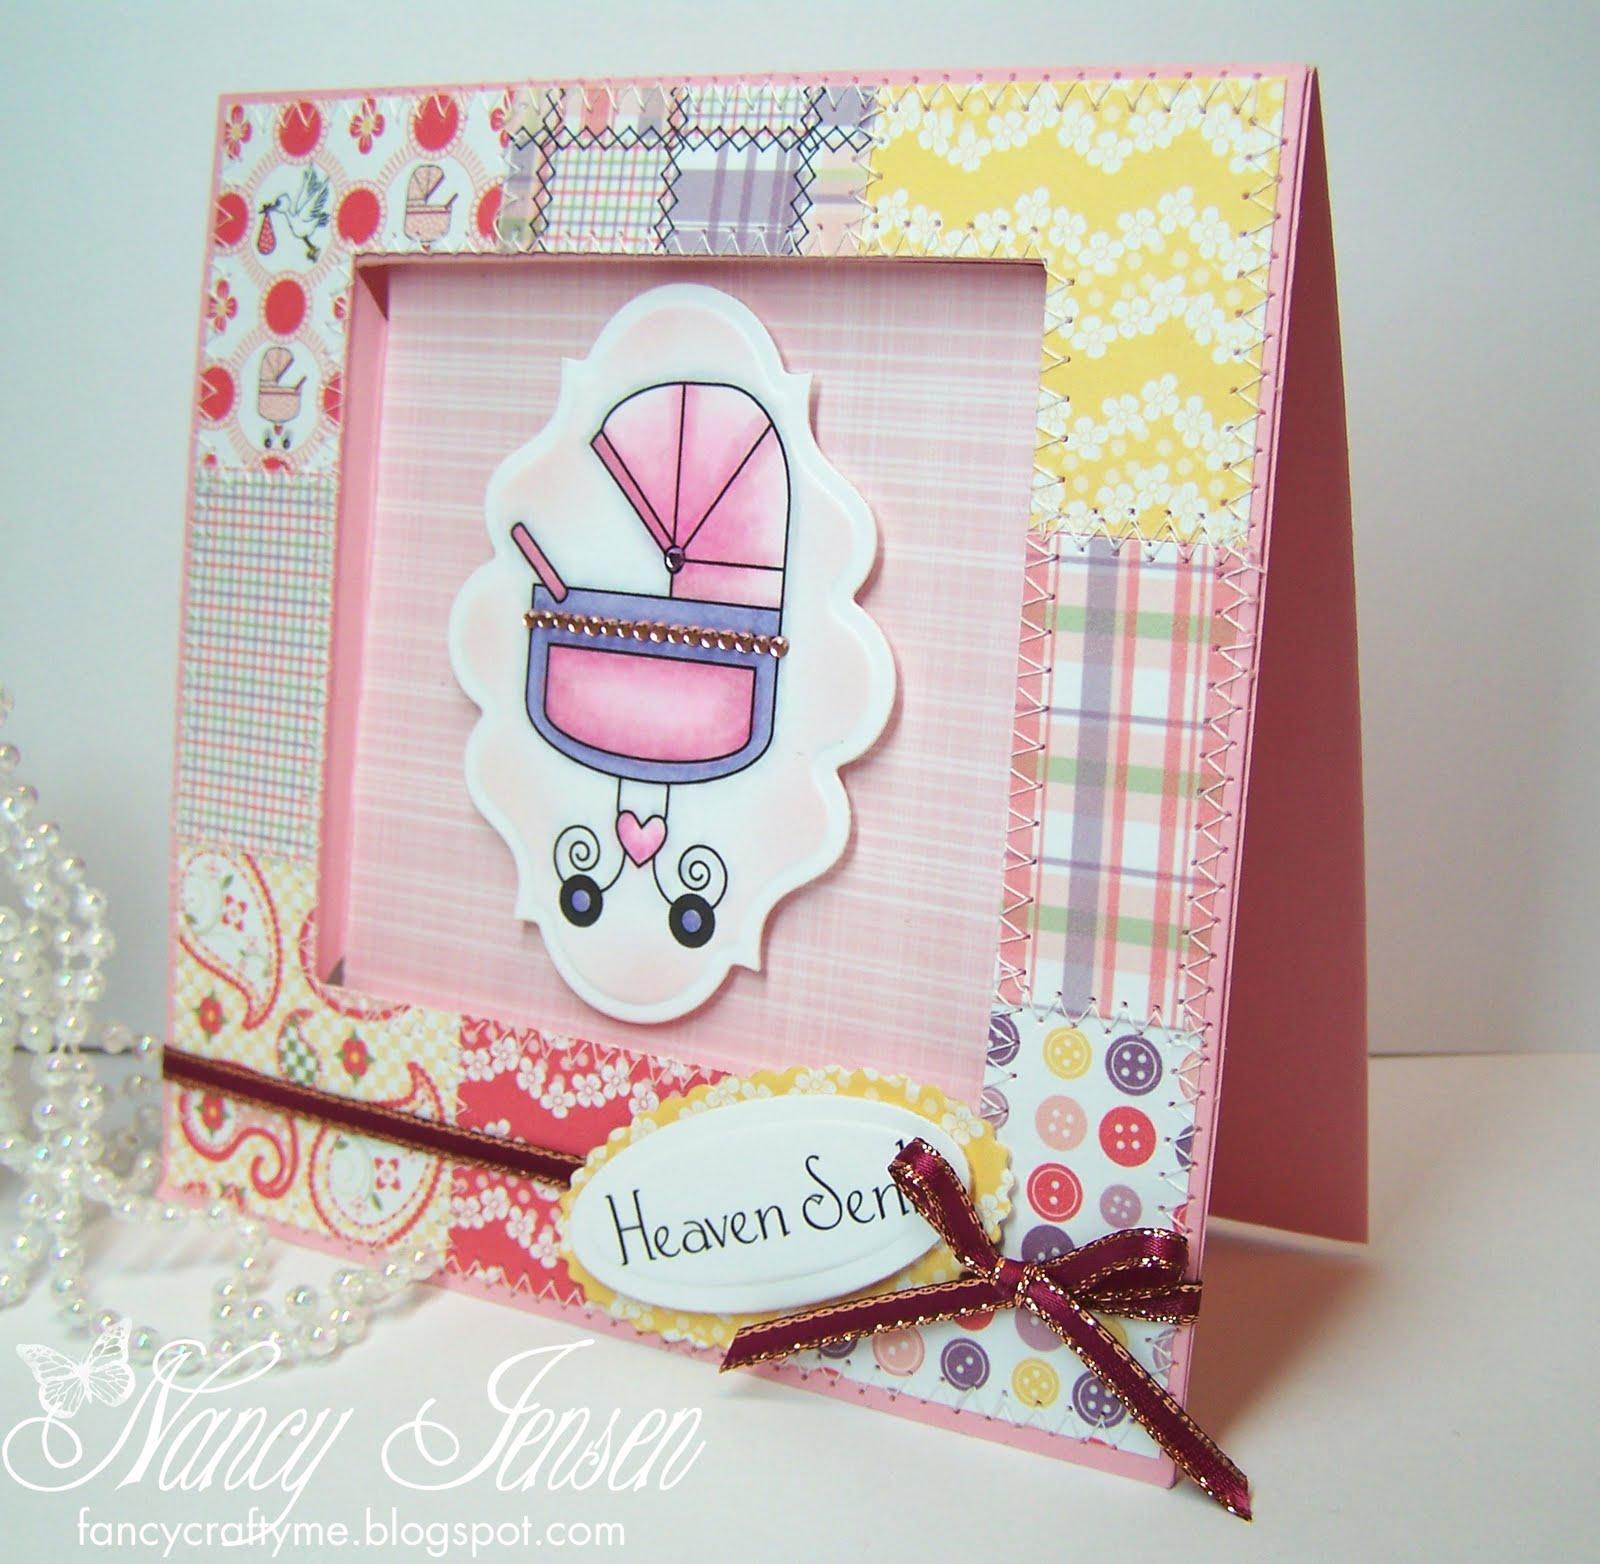 http://2.bp.blogspot.com/-3U1GA_4EqYI/TfpV81g6vJI/AAAAAAAACNc/RgEUmIFfX1A/s1600/mtme+14+baby+girl+6.jpg